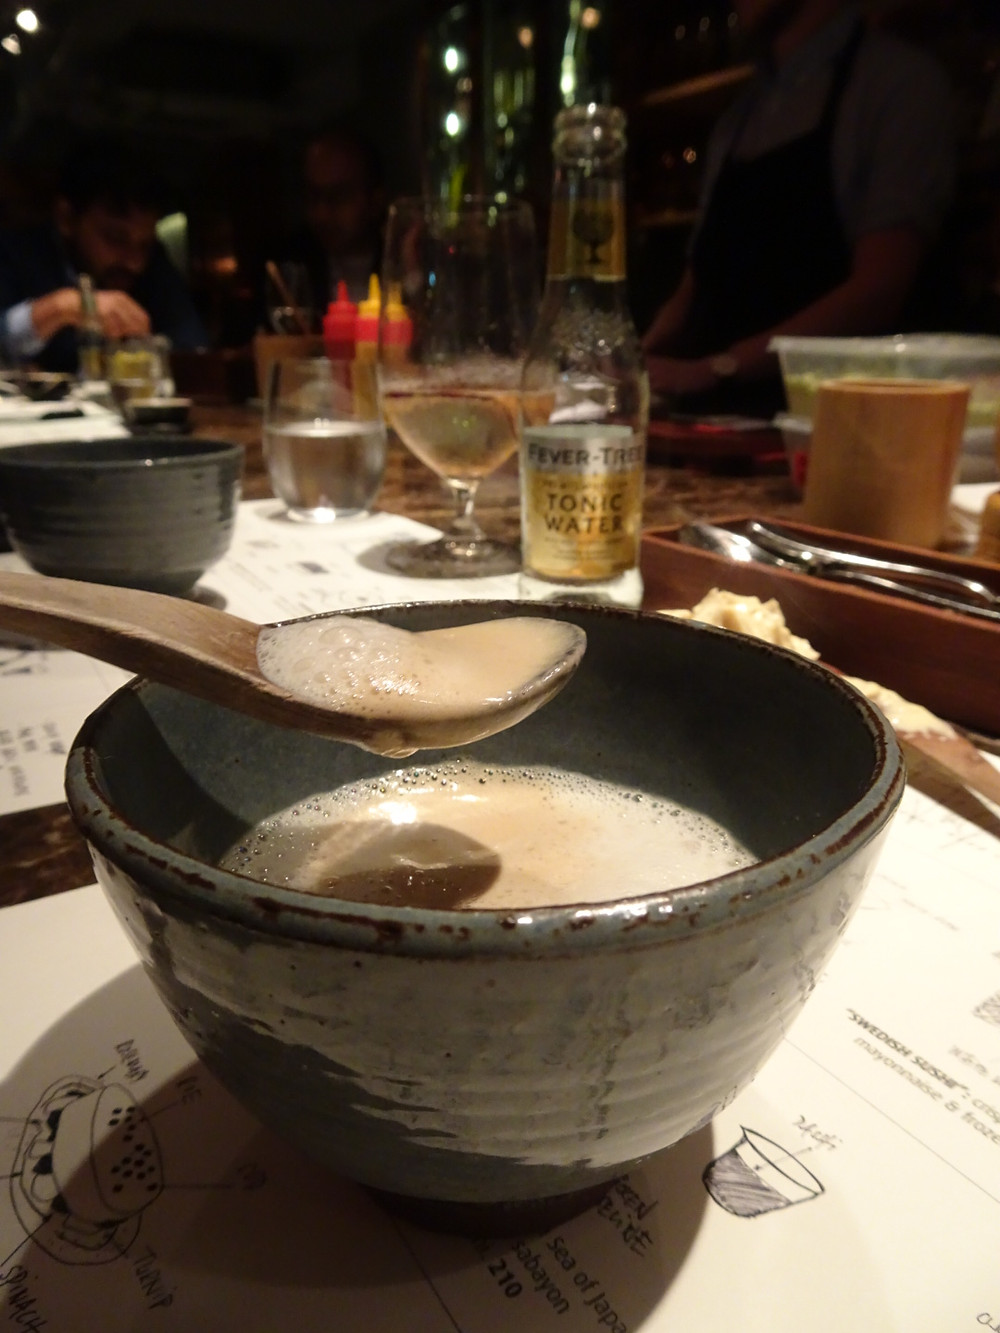 Food at Frantzen's Kitchen restaurant by Bjorn Frantzen in Hong Kong